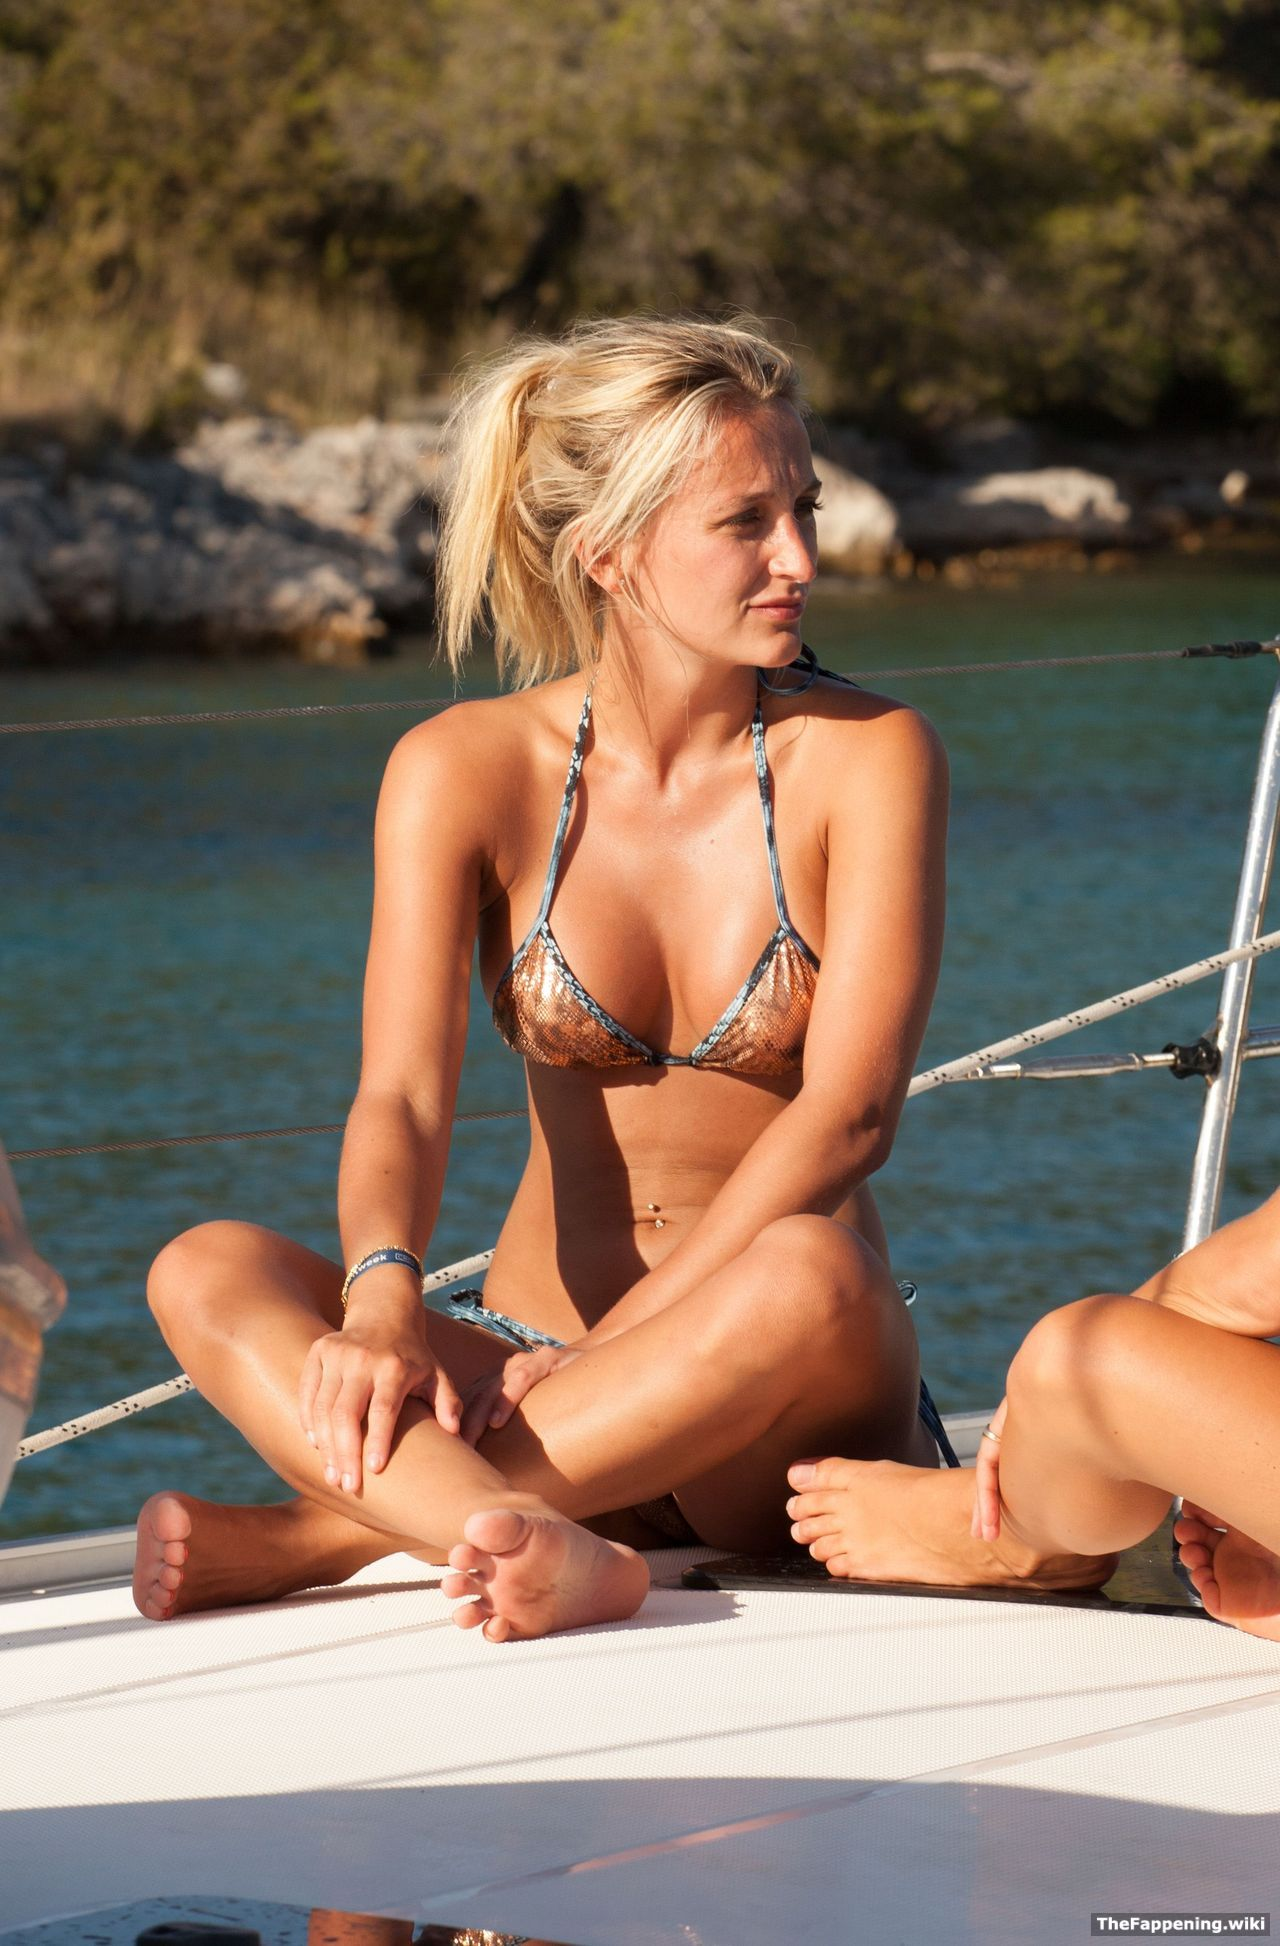 Tiffany Watson Nude Pics  Vids - The Fappening-6407